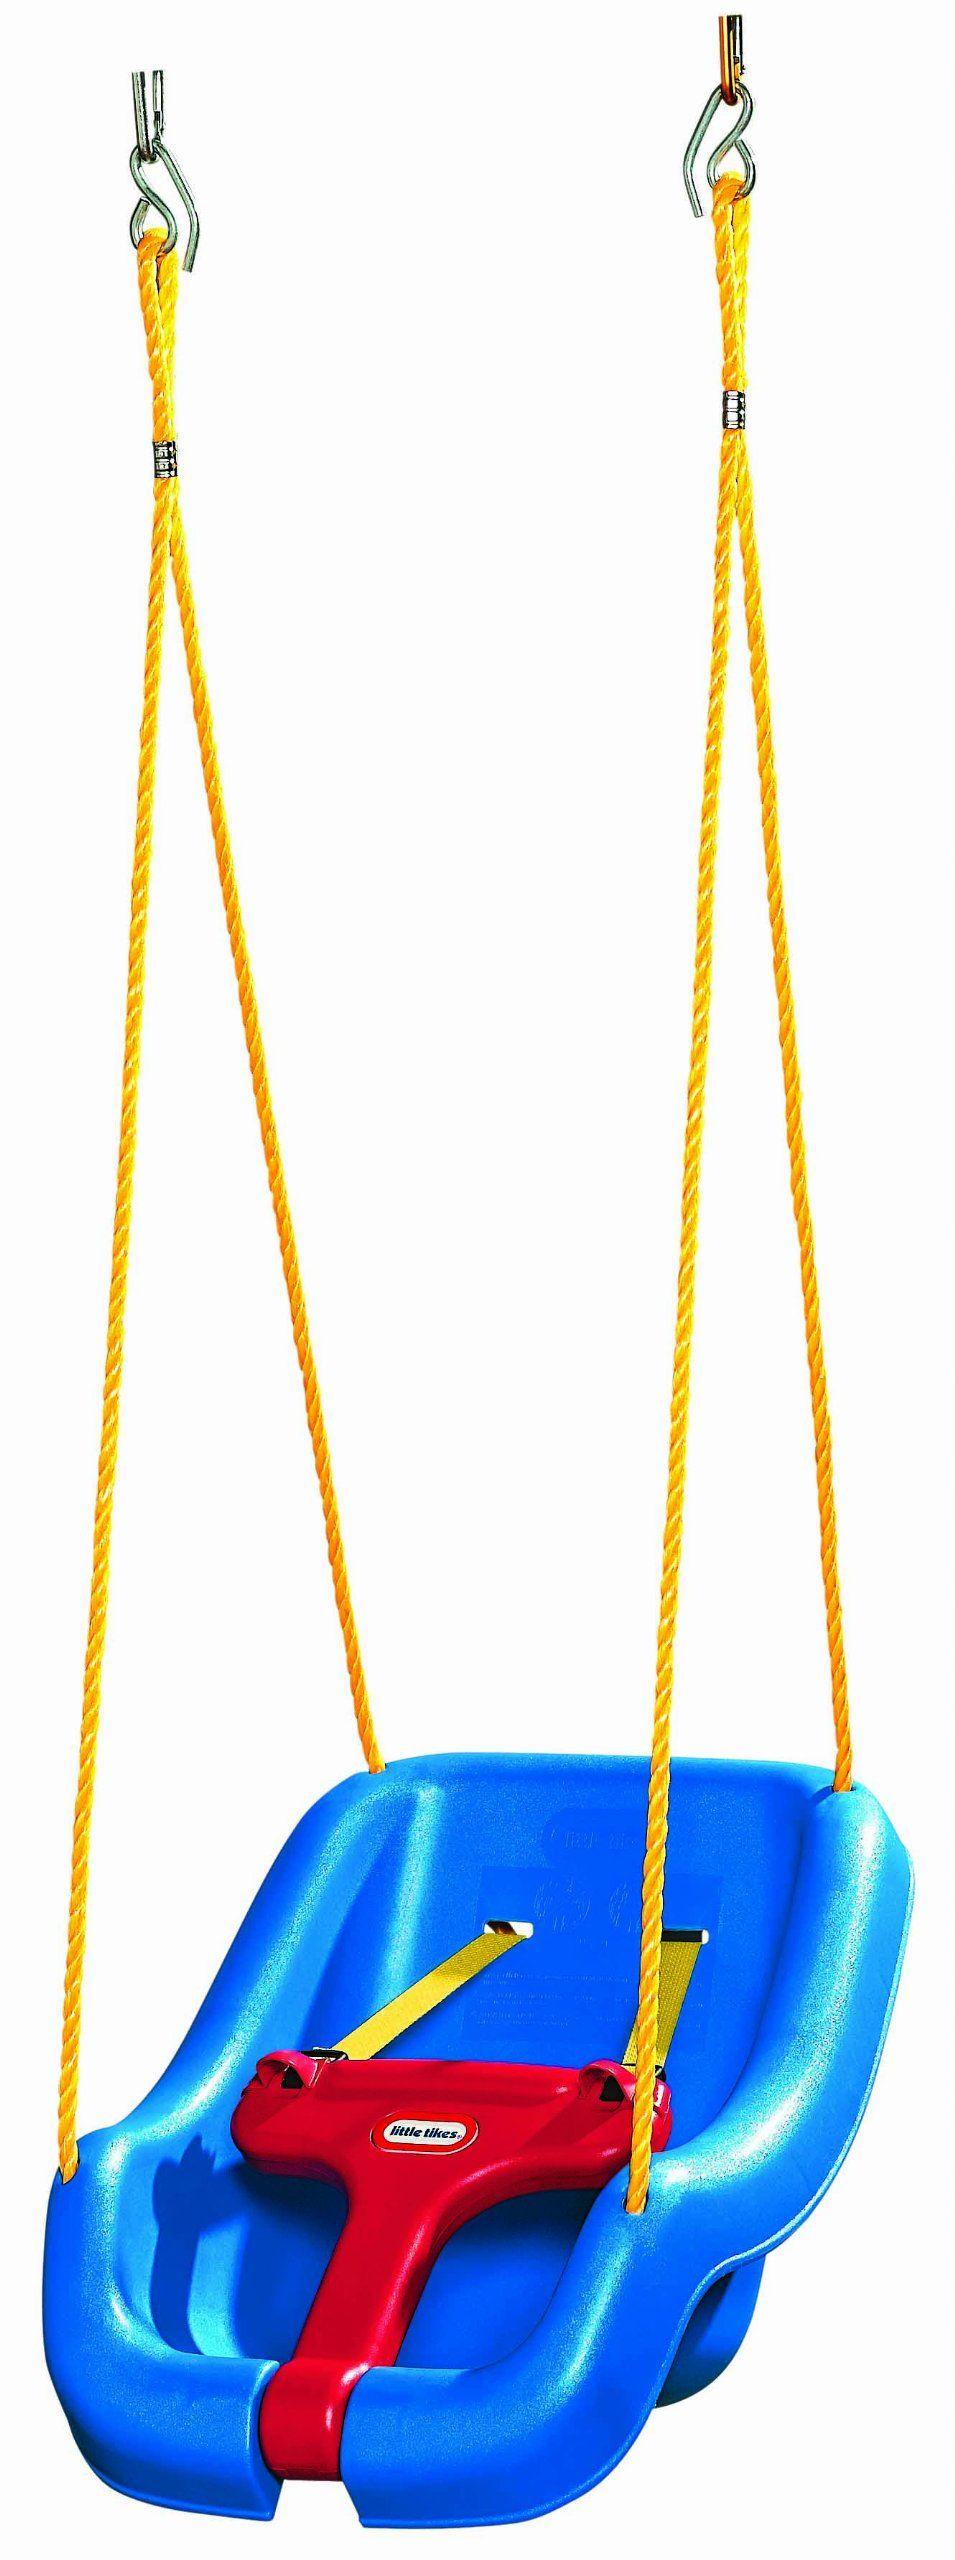 Amazon little tikes in snug un secure swing blue toys